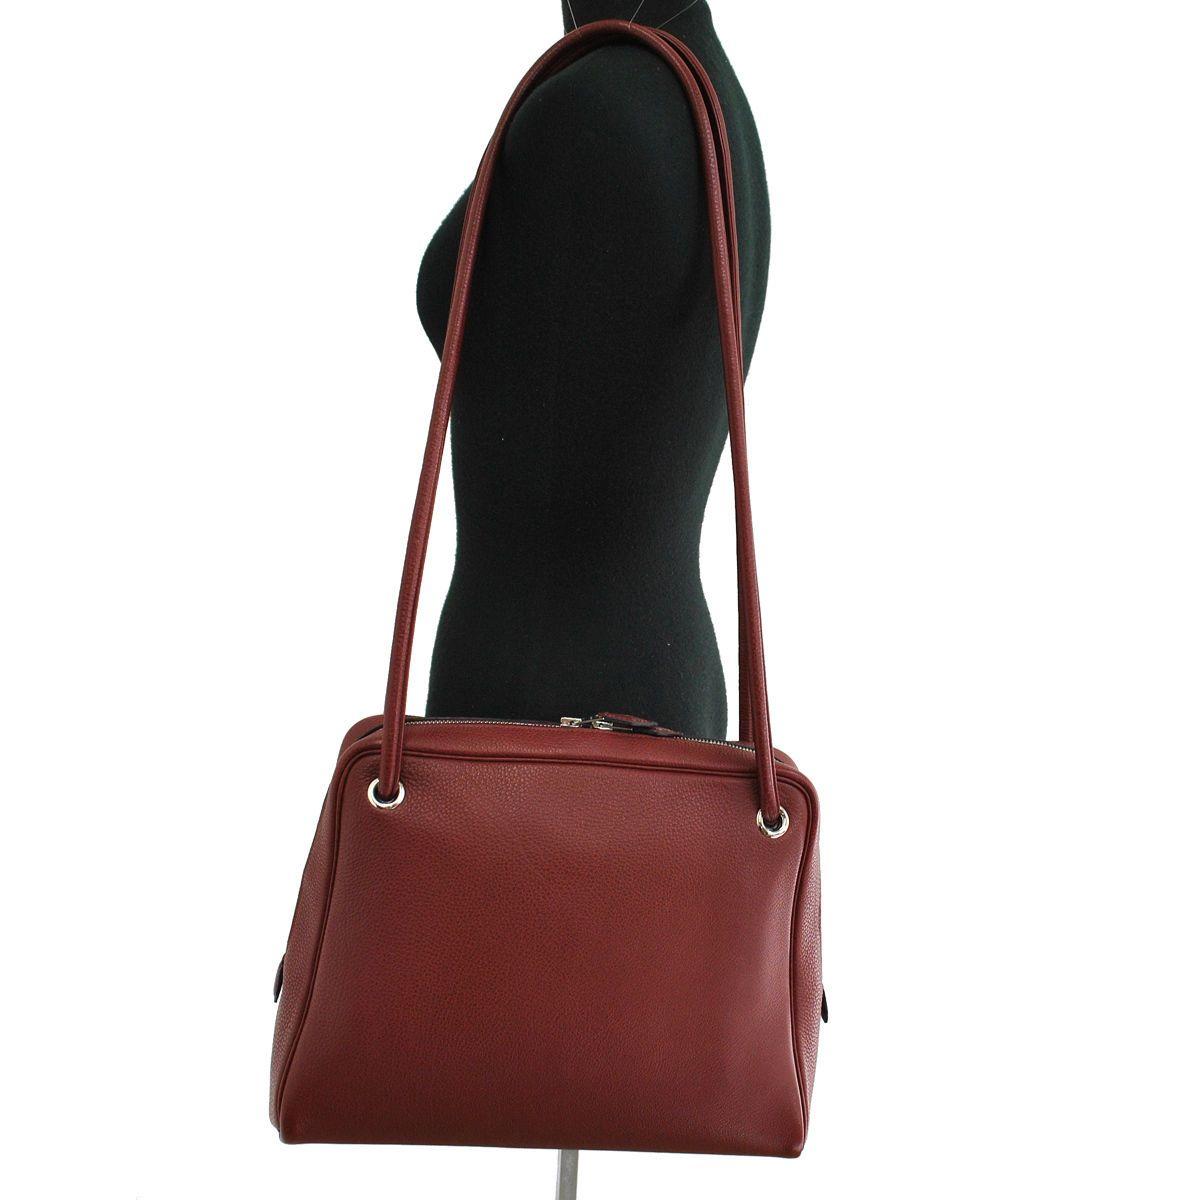 Authentic Hermes Tintin Shoulder Bag Bordeaux Silver Togo Vintage France  SN00561  c3fc35acf0c46